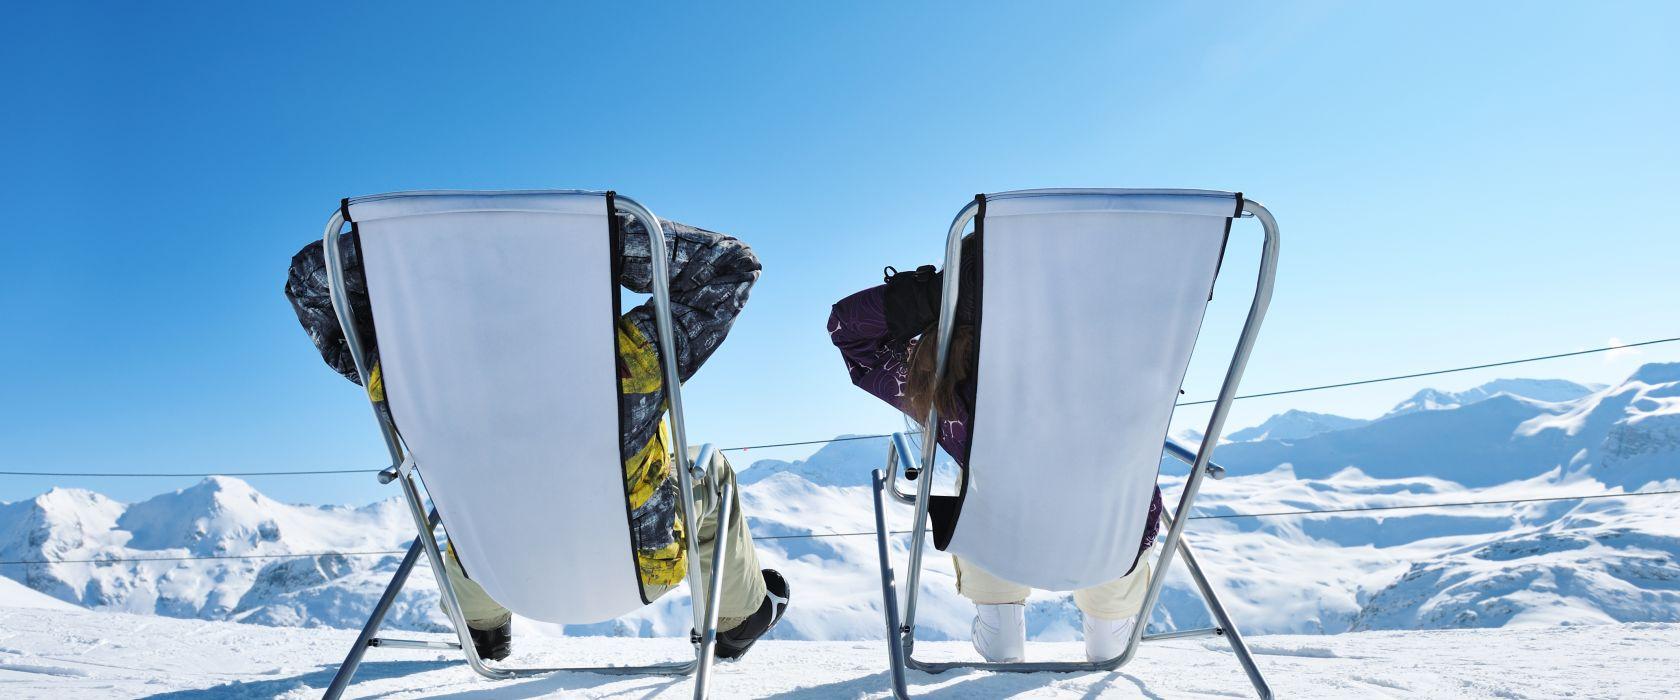 Le ski au printemps